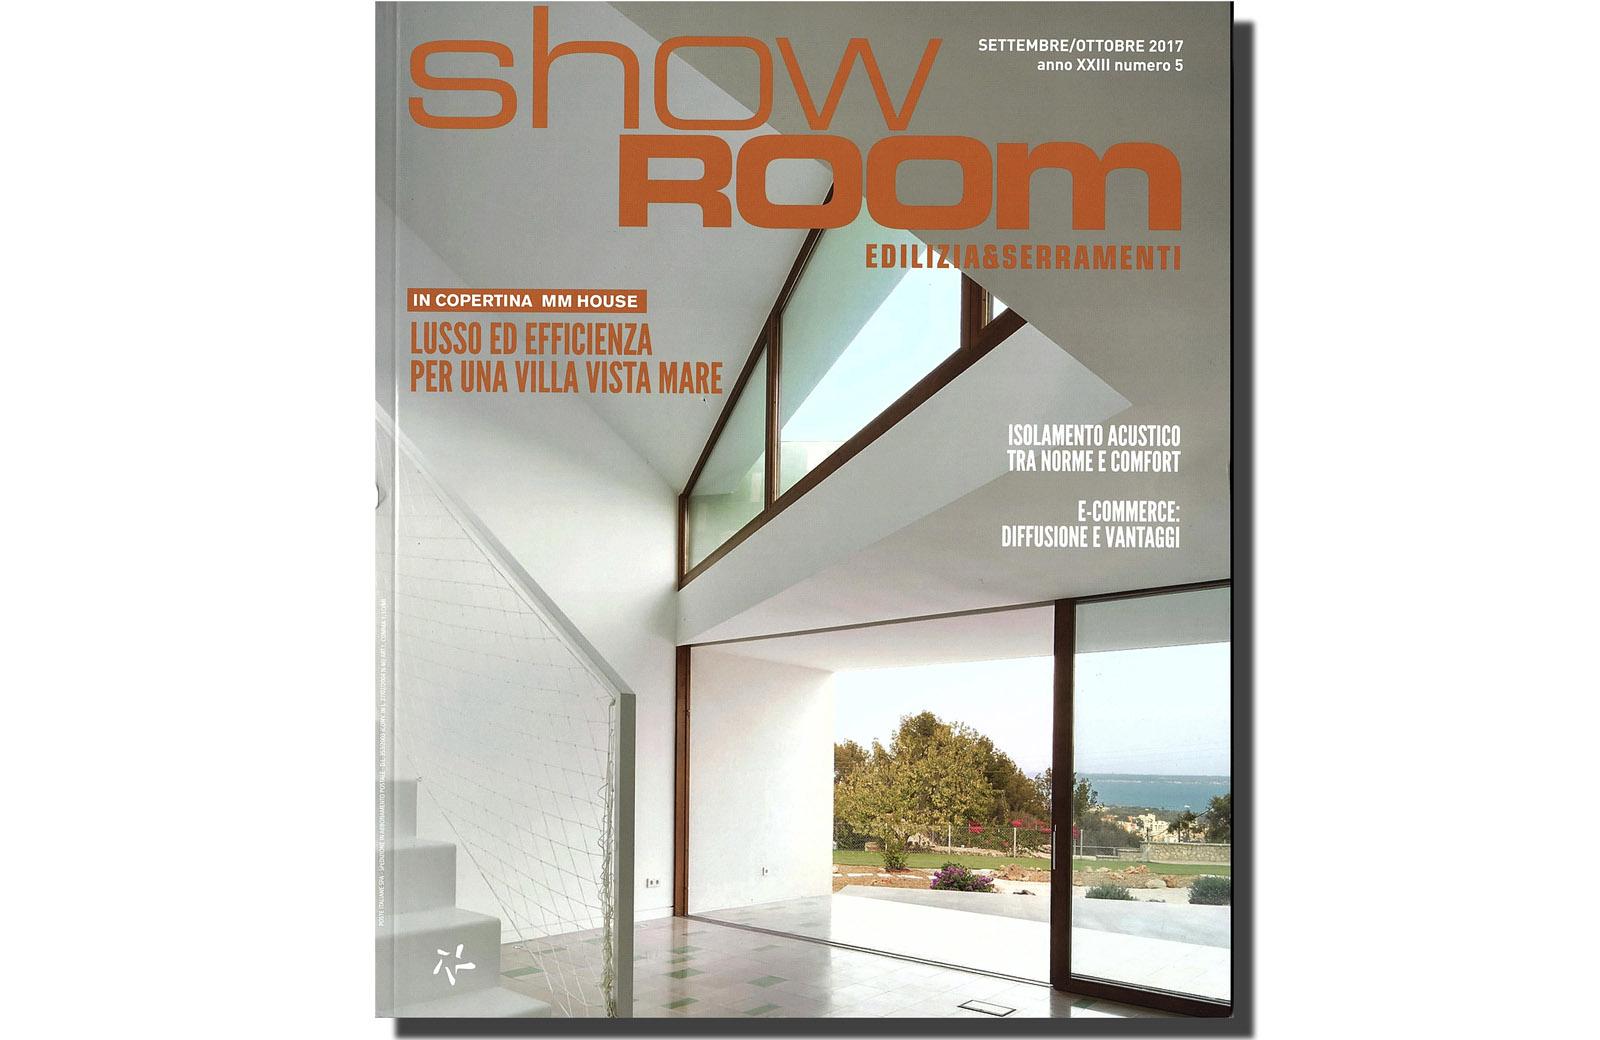 showroom-edilizia-serramenti_casa-mm_portada